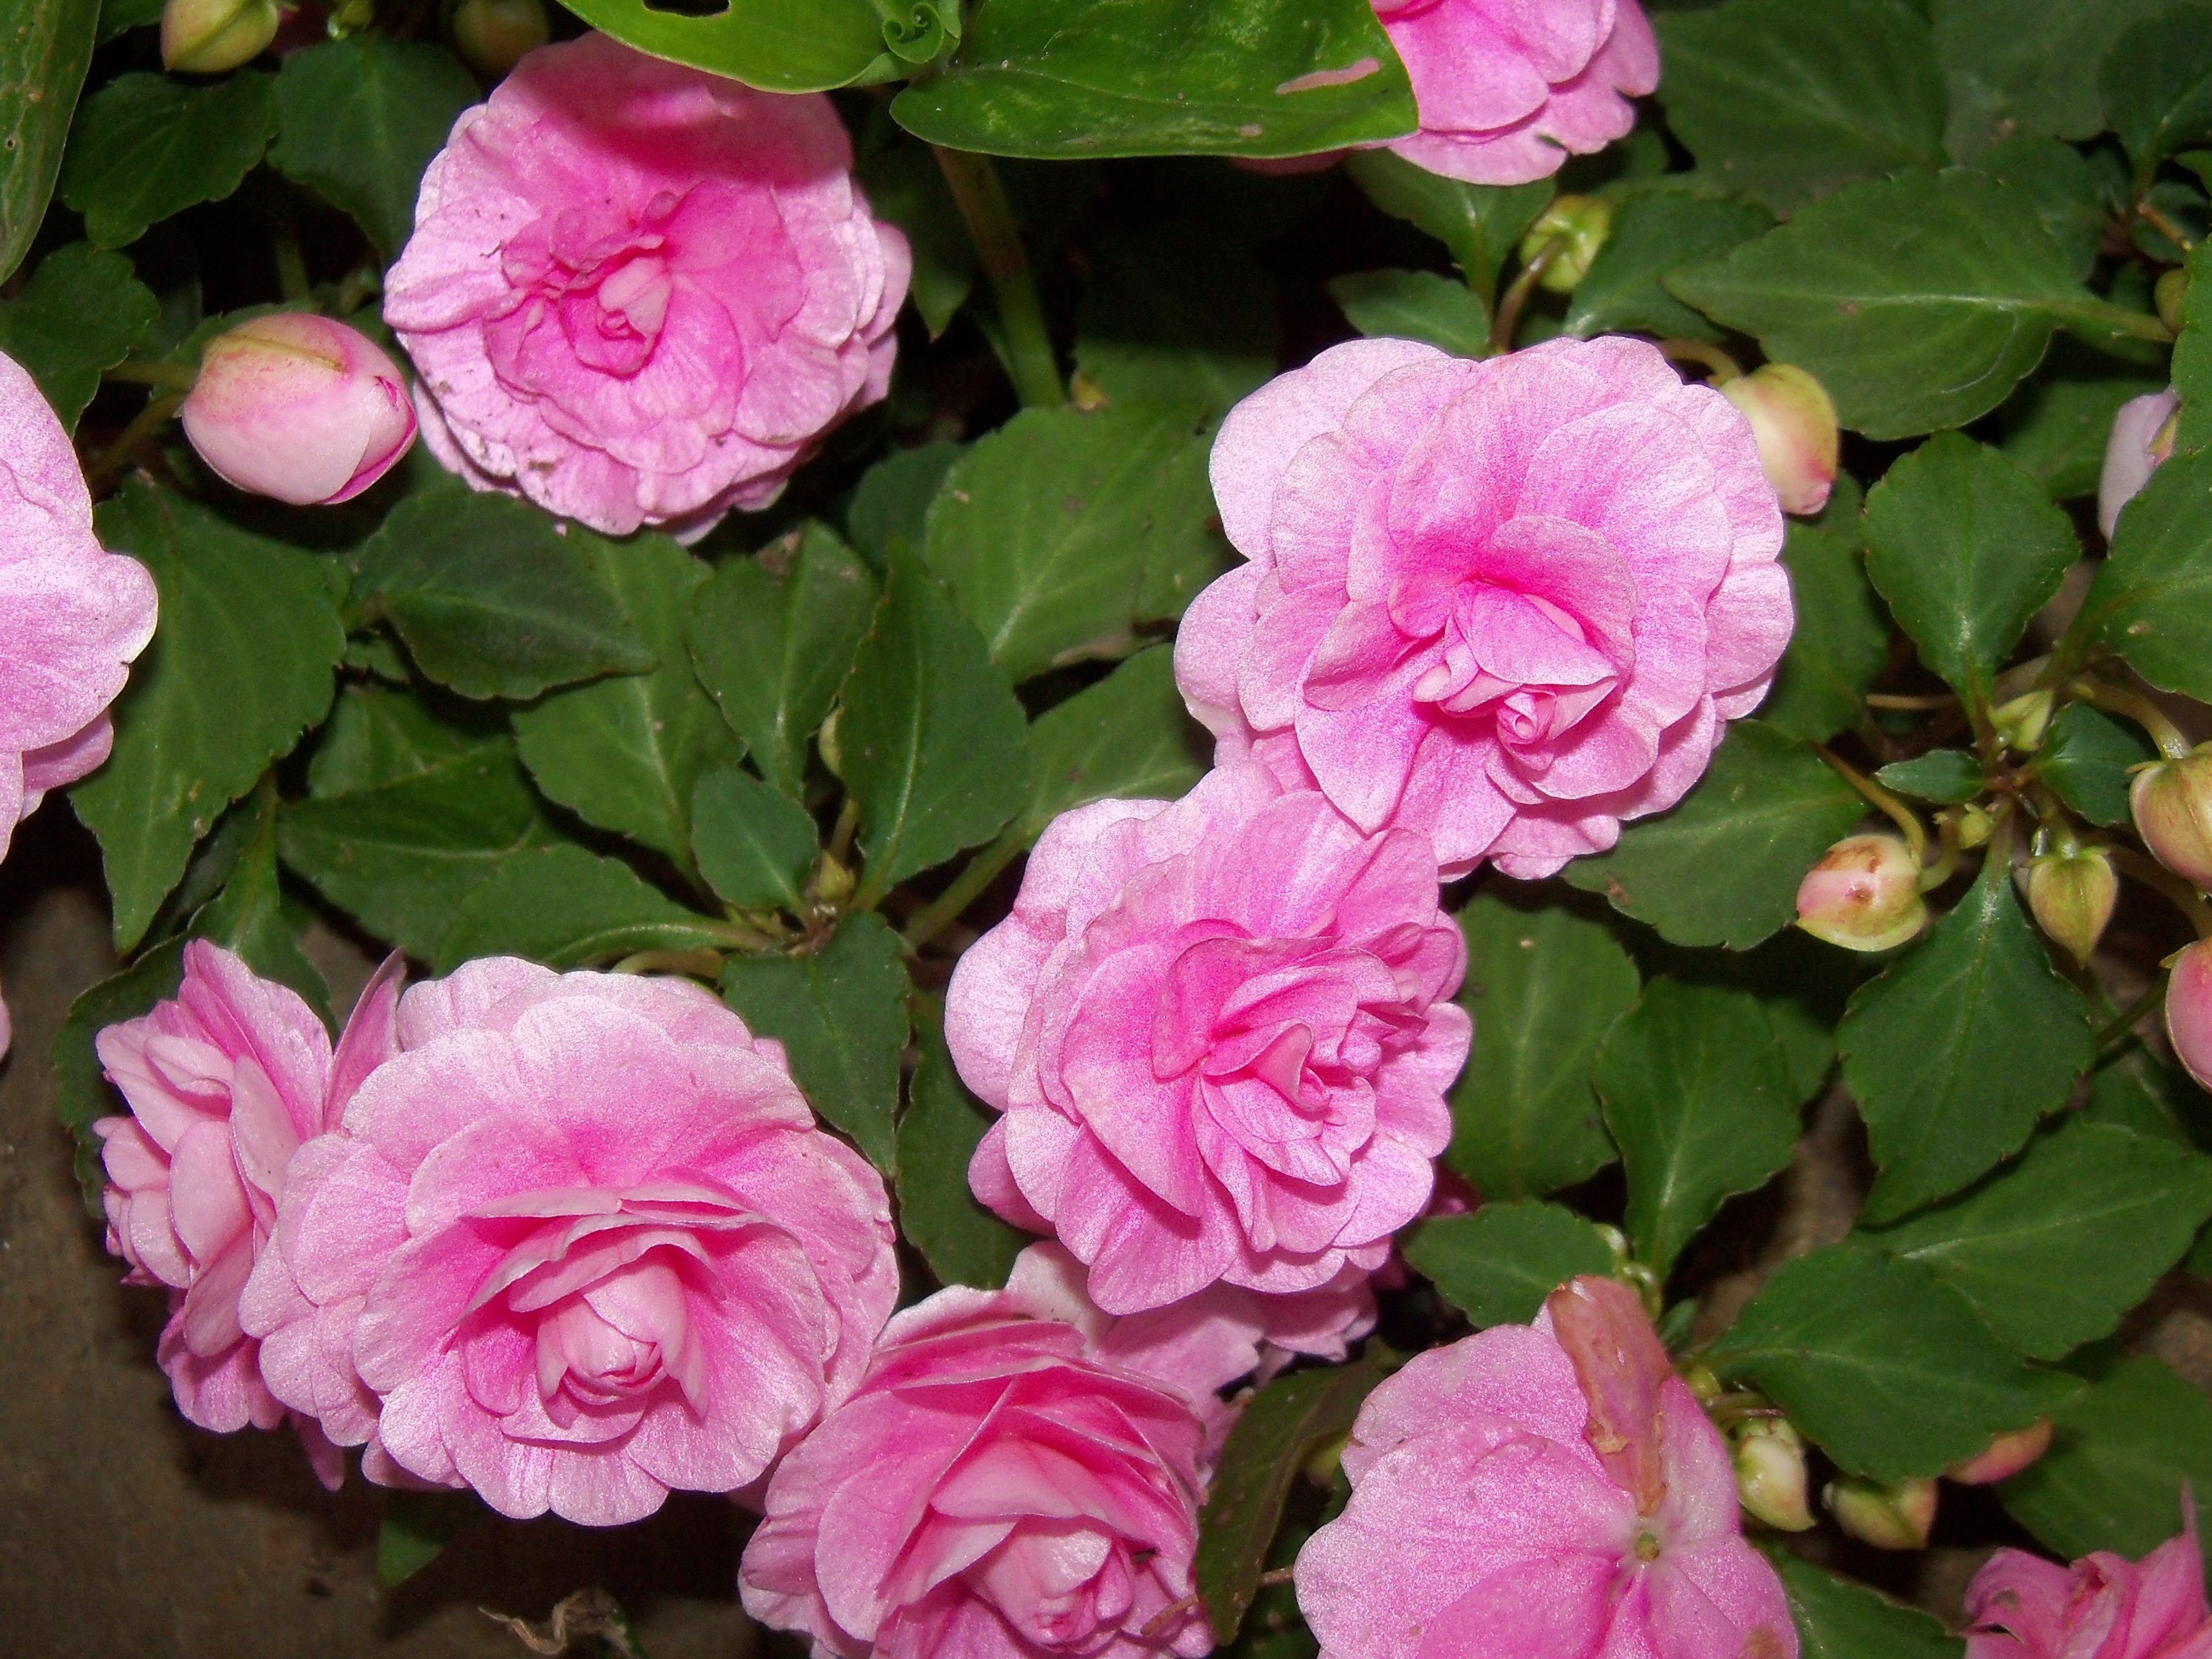 Alegrias del hogar dobles flores pinterest alegria dobles y hogar - Planta alegria del hogar ...